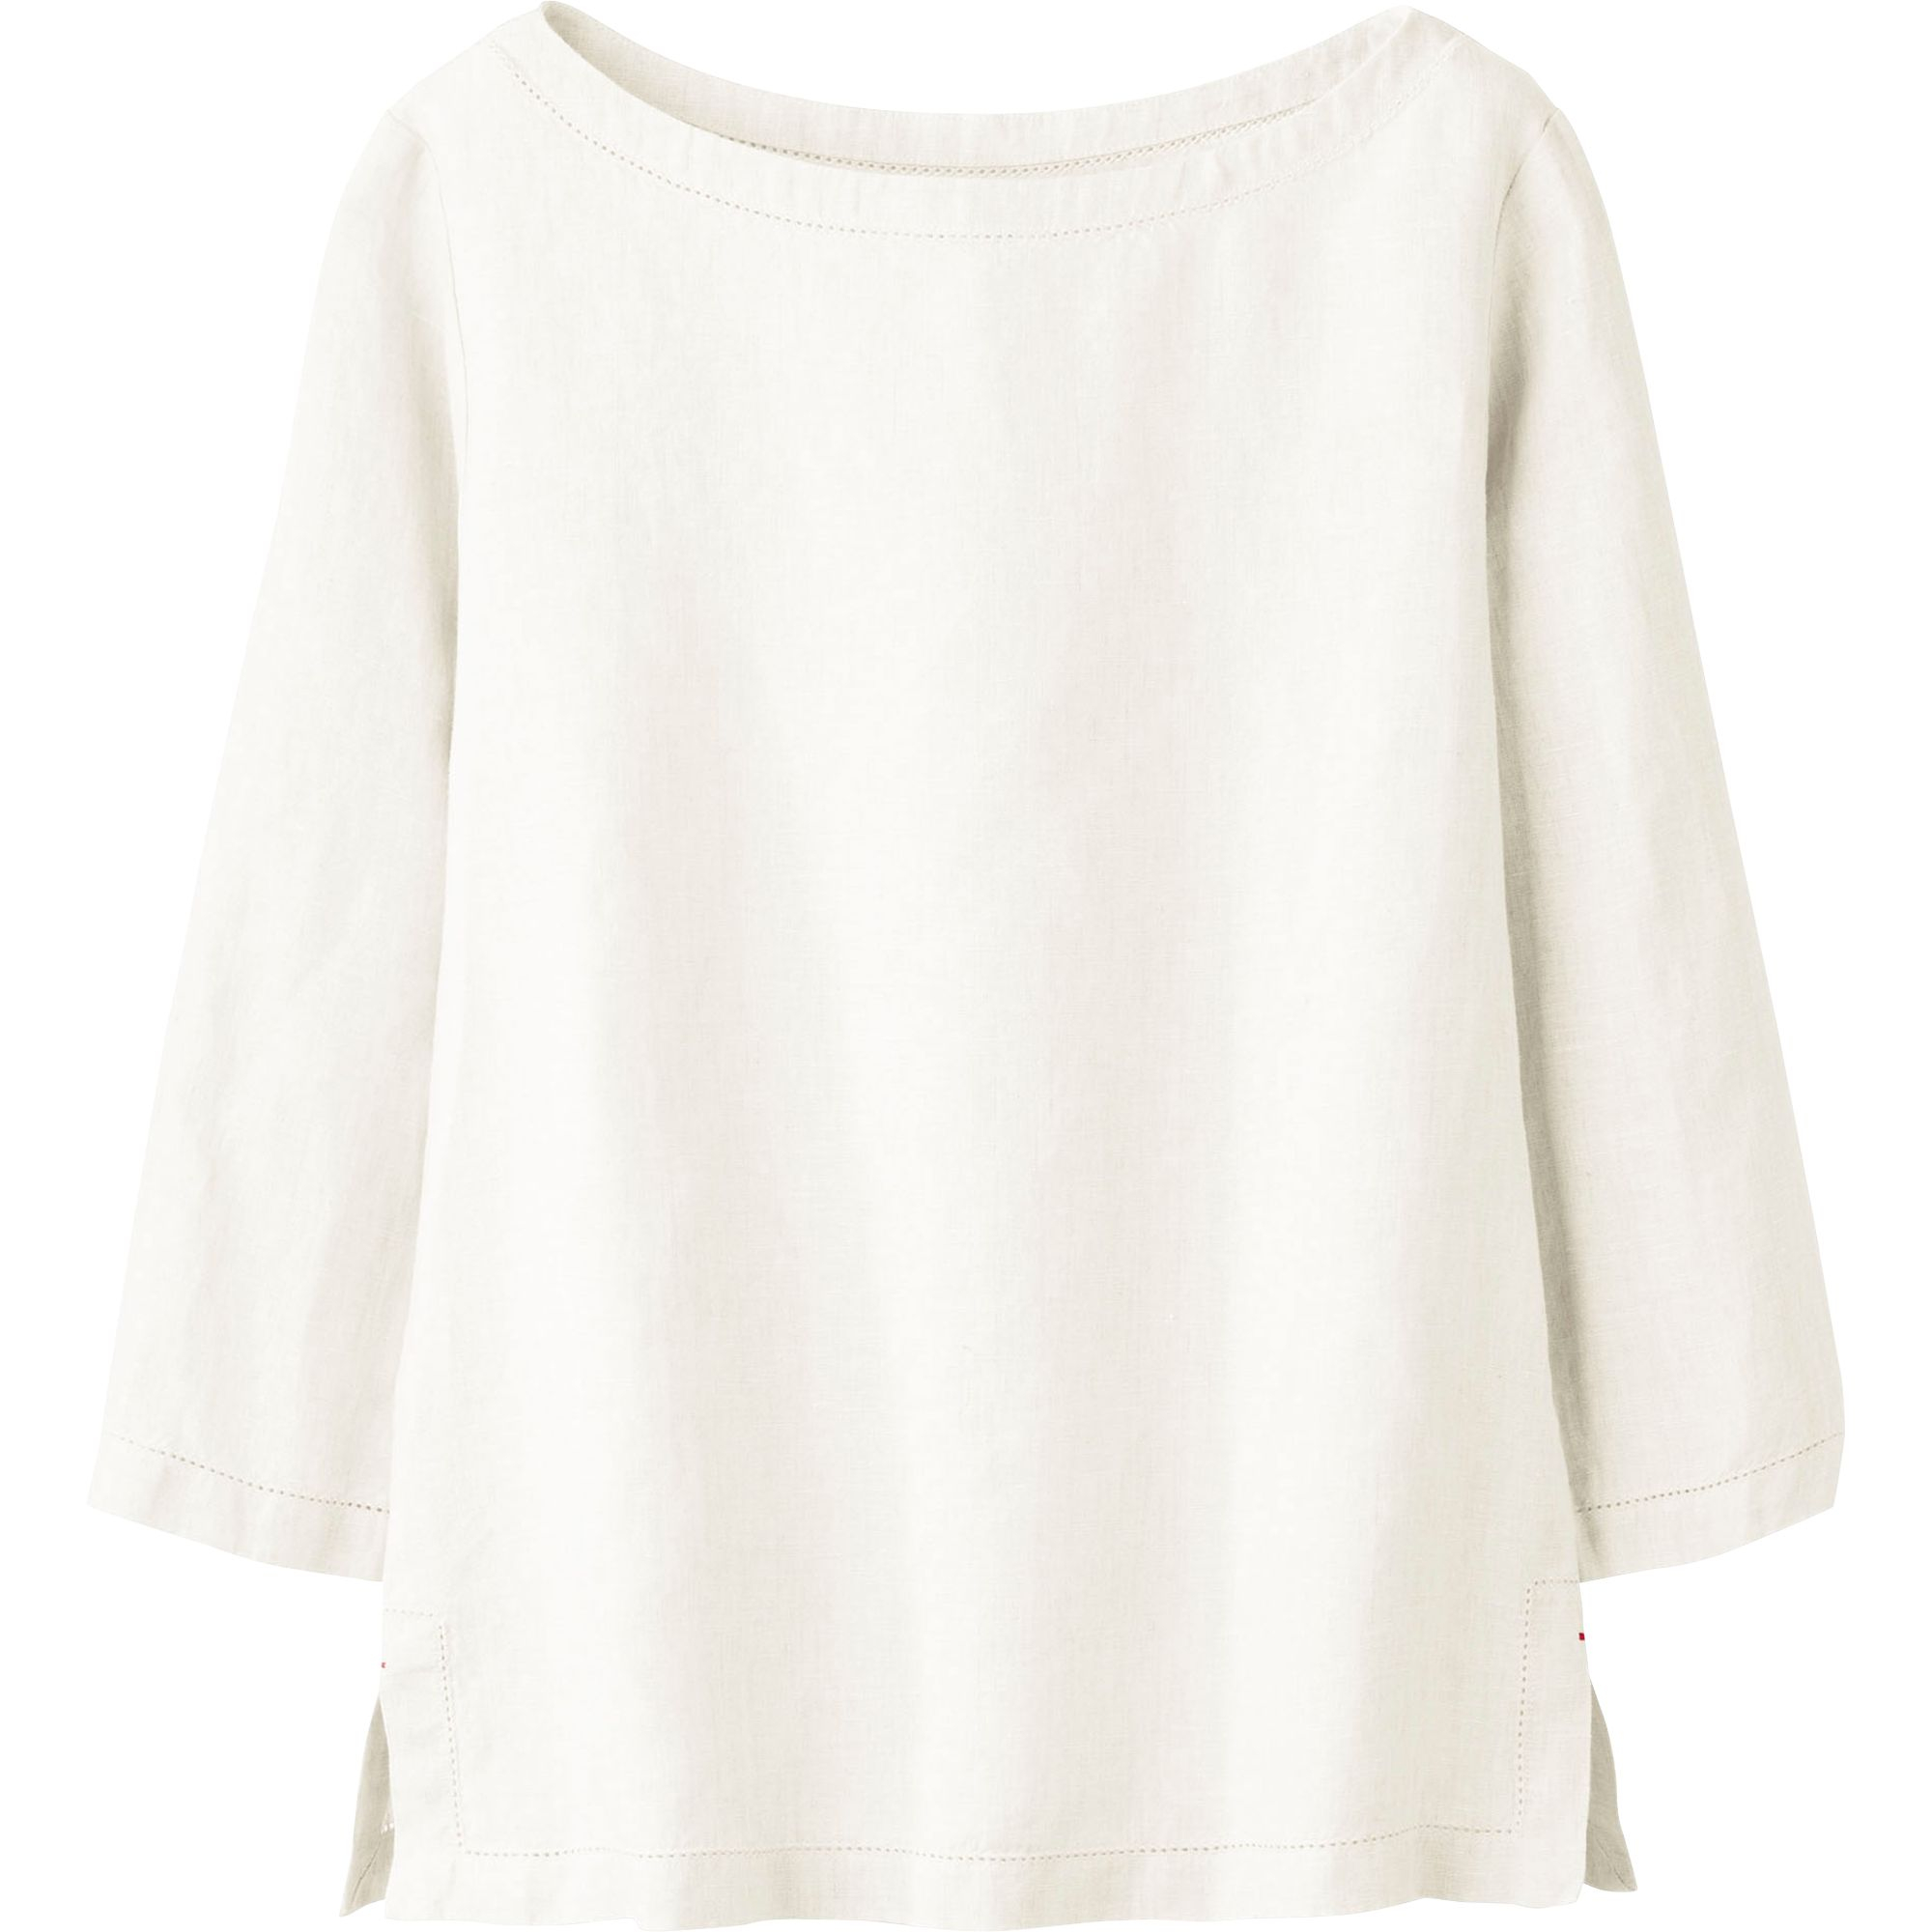 uniqlo women idlf linen boat neck pull over shirt in white off white lyst. Black Bedroom Furniture Sets. Home Design Ideas